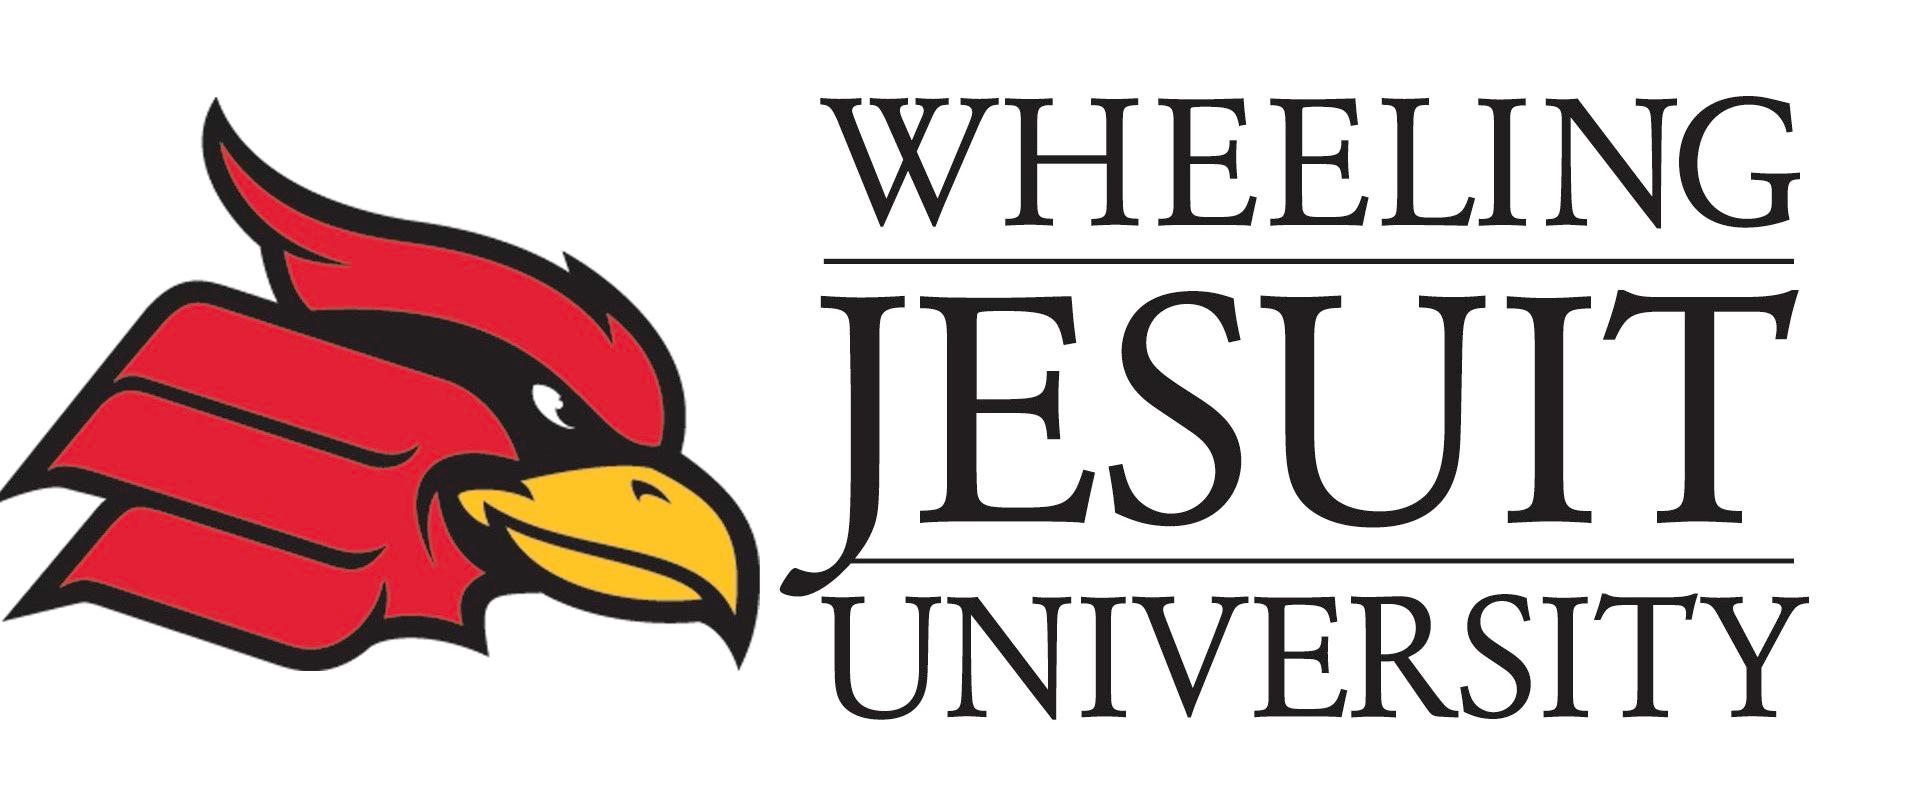 jesuit logo_1528467501384.png.jpg